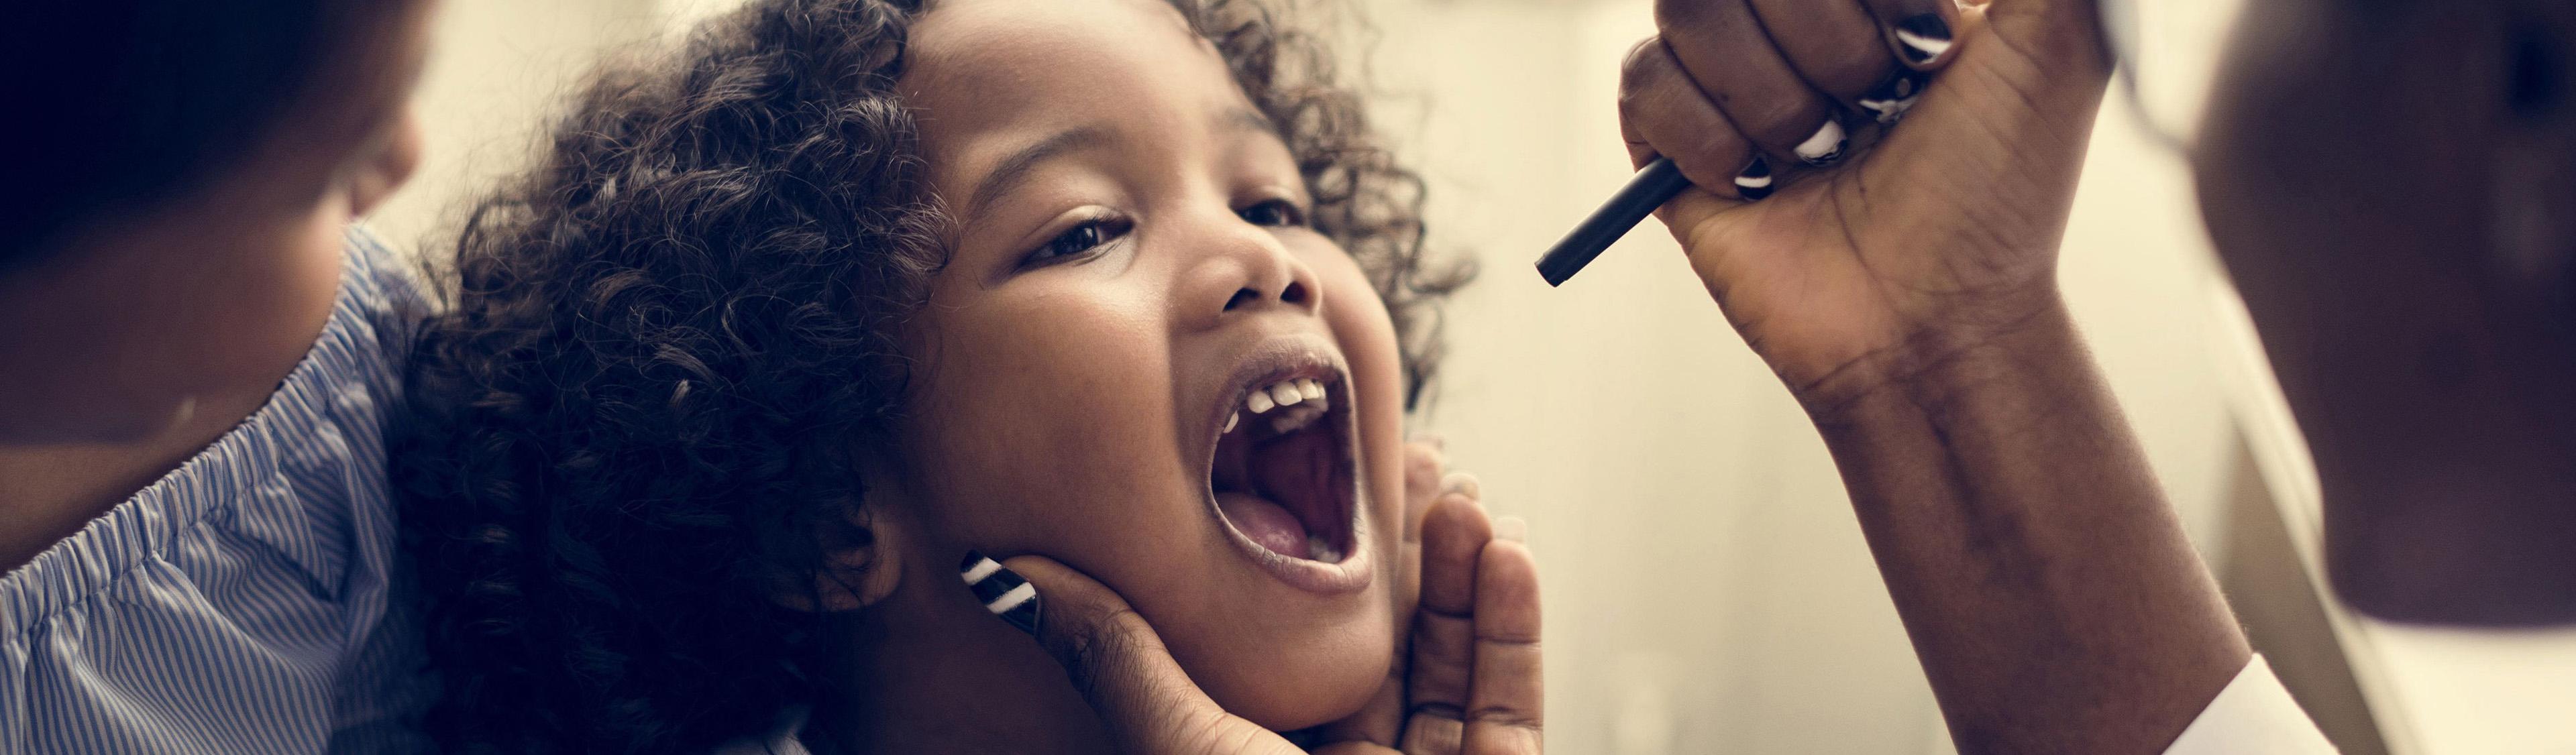 EY - Little girl having her teeth checked